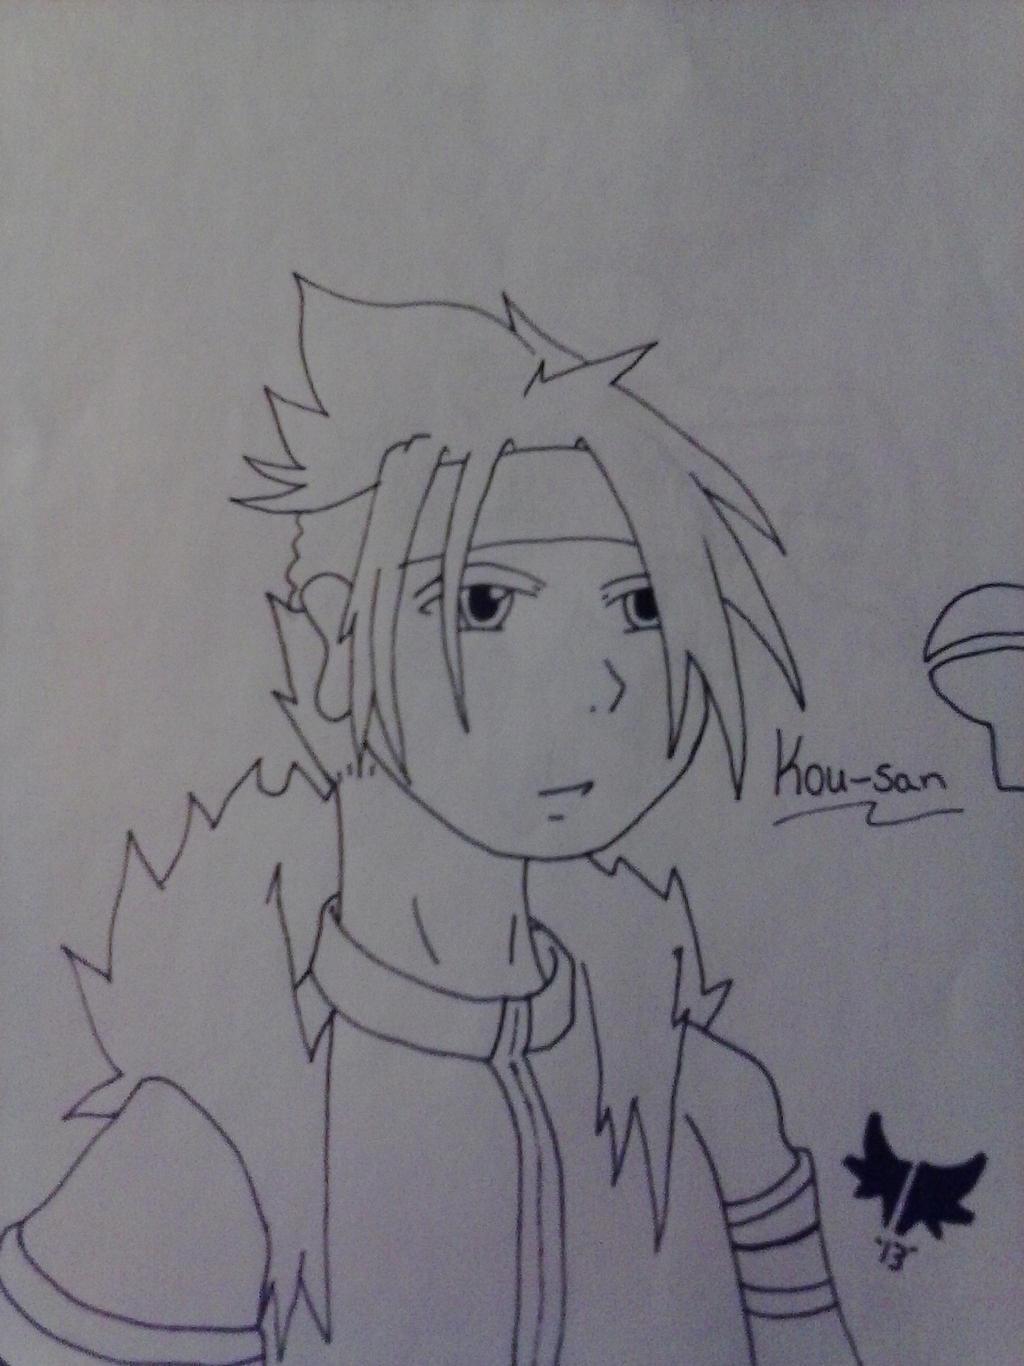 Kou-san (friend's Oc) by AuraLeighDragon